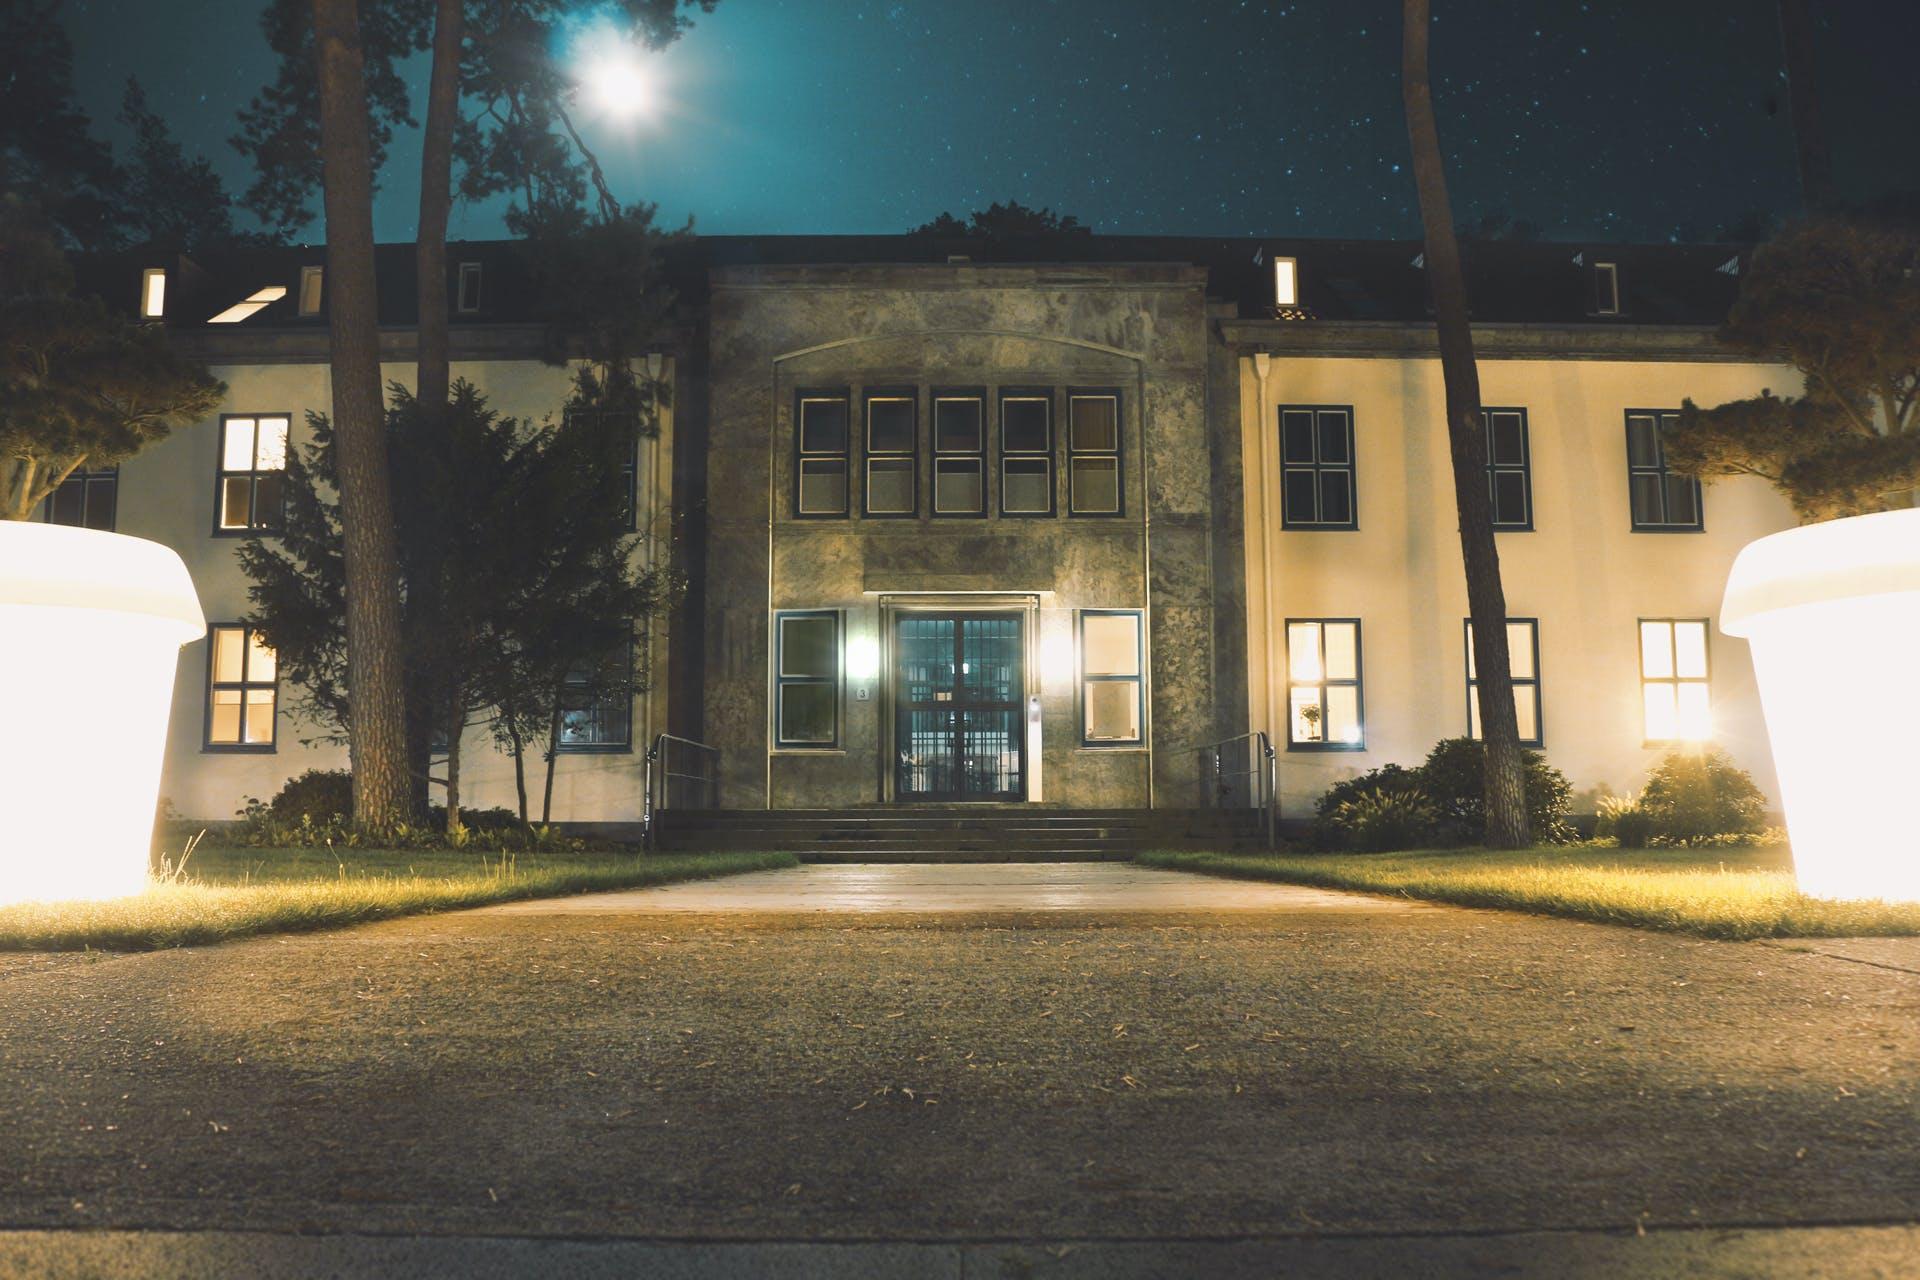 Free stock photo of building, architecture, windows, pavement